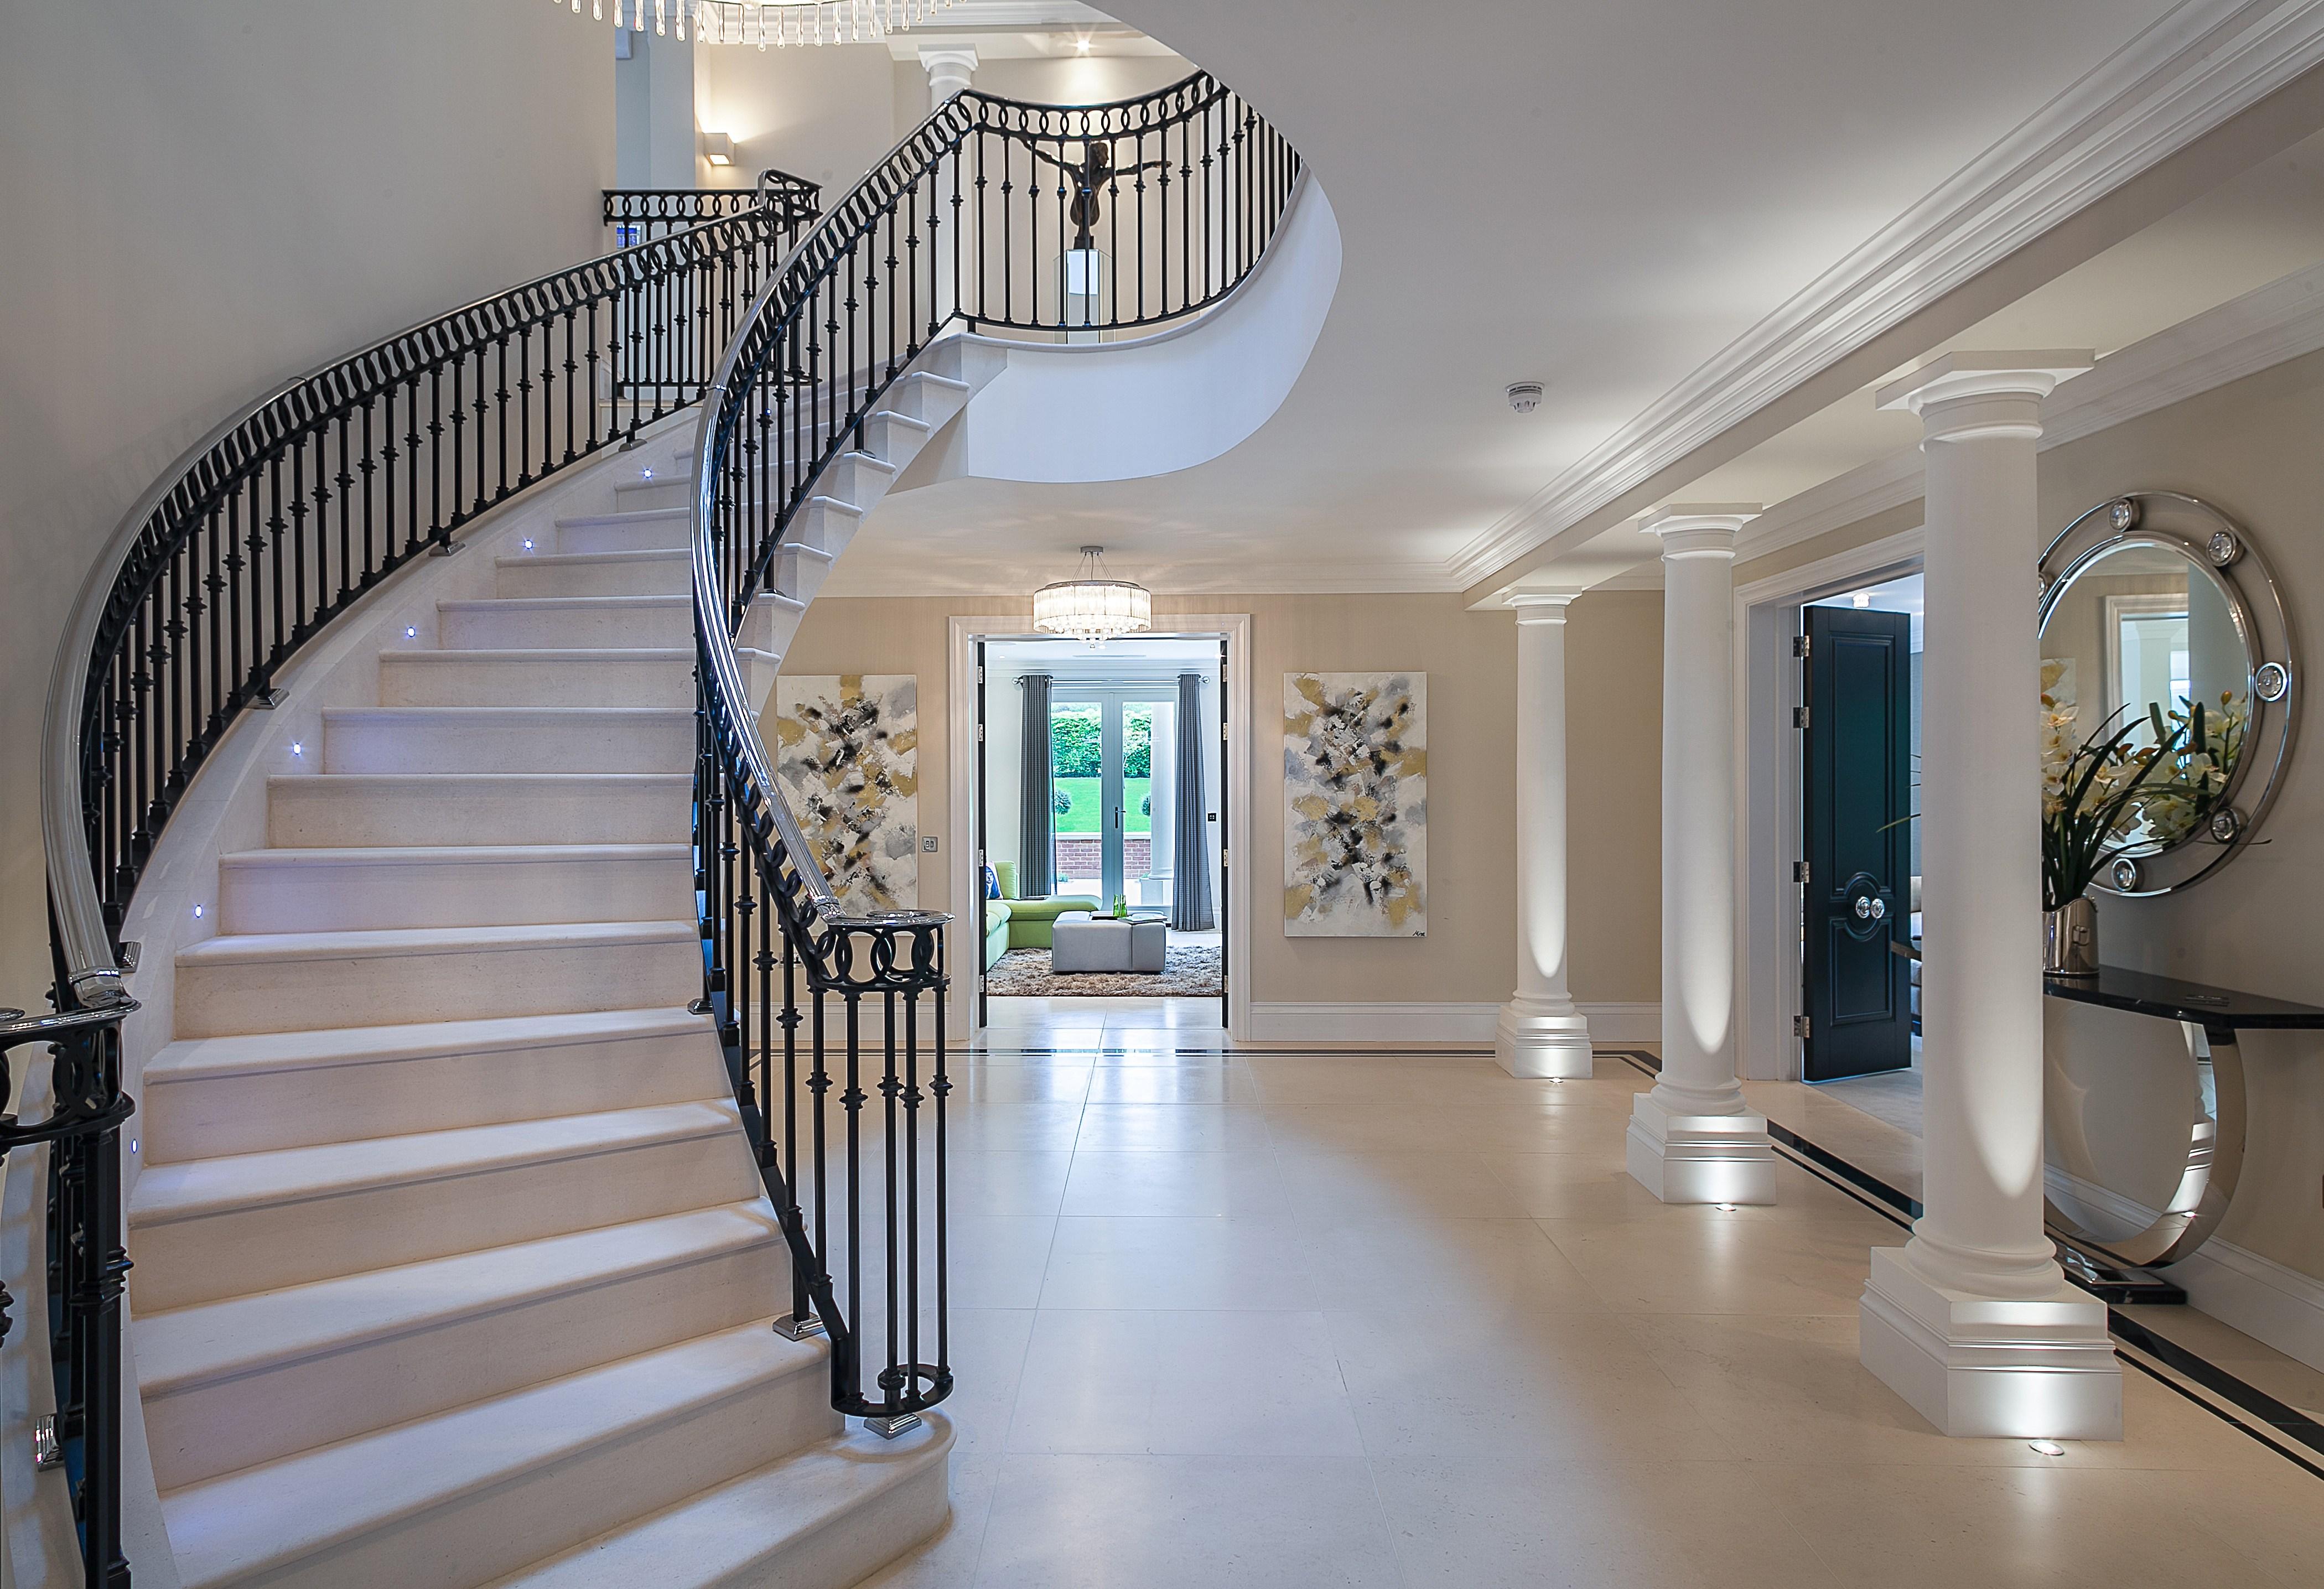 Black Granite A Brief History Ian Knapper | Black Granite Staircase Designs | Marble | Polished Granite | Floor Stair Circular | Kota Stone Staircase | Jet Black